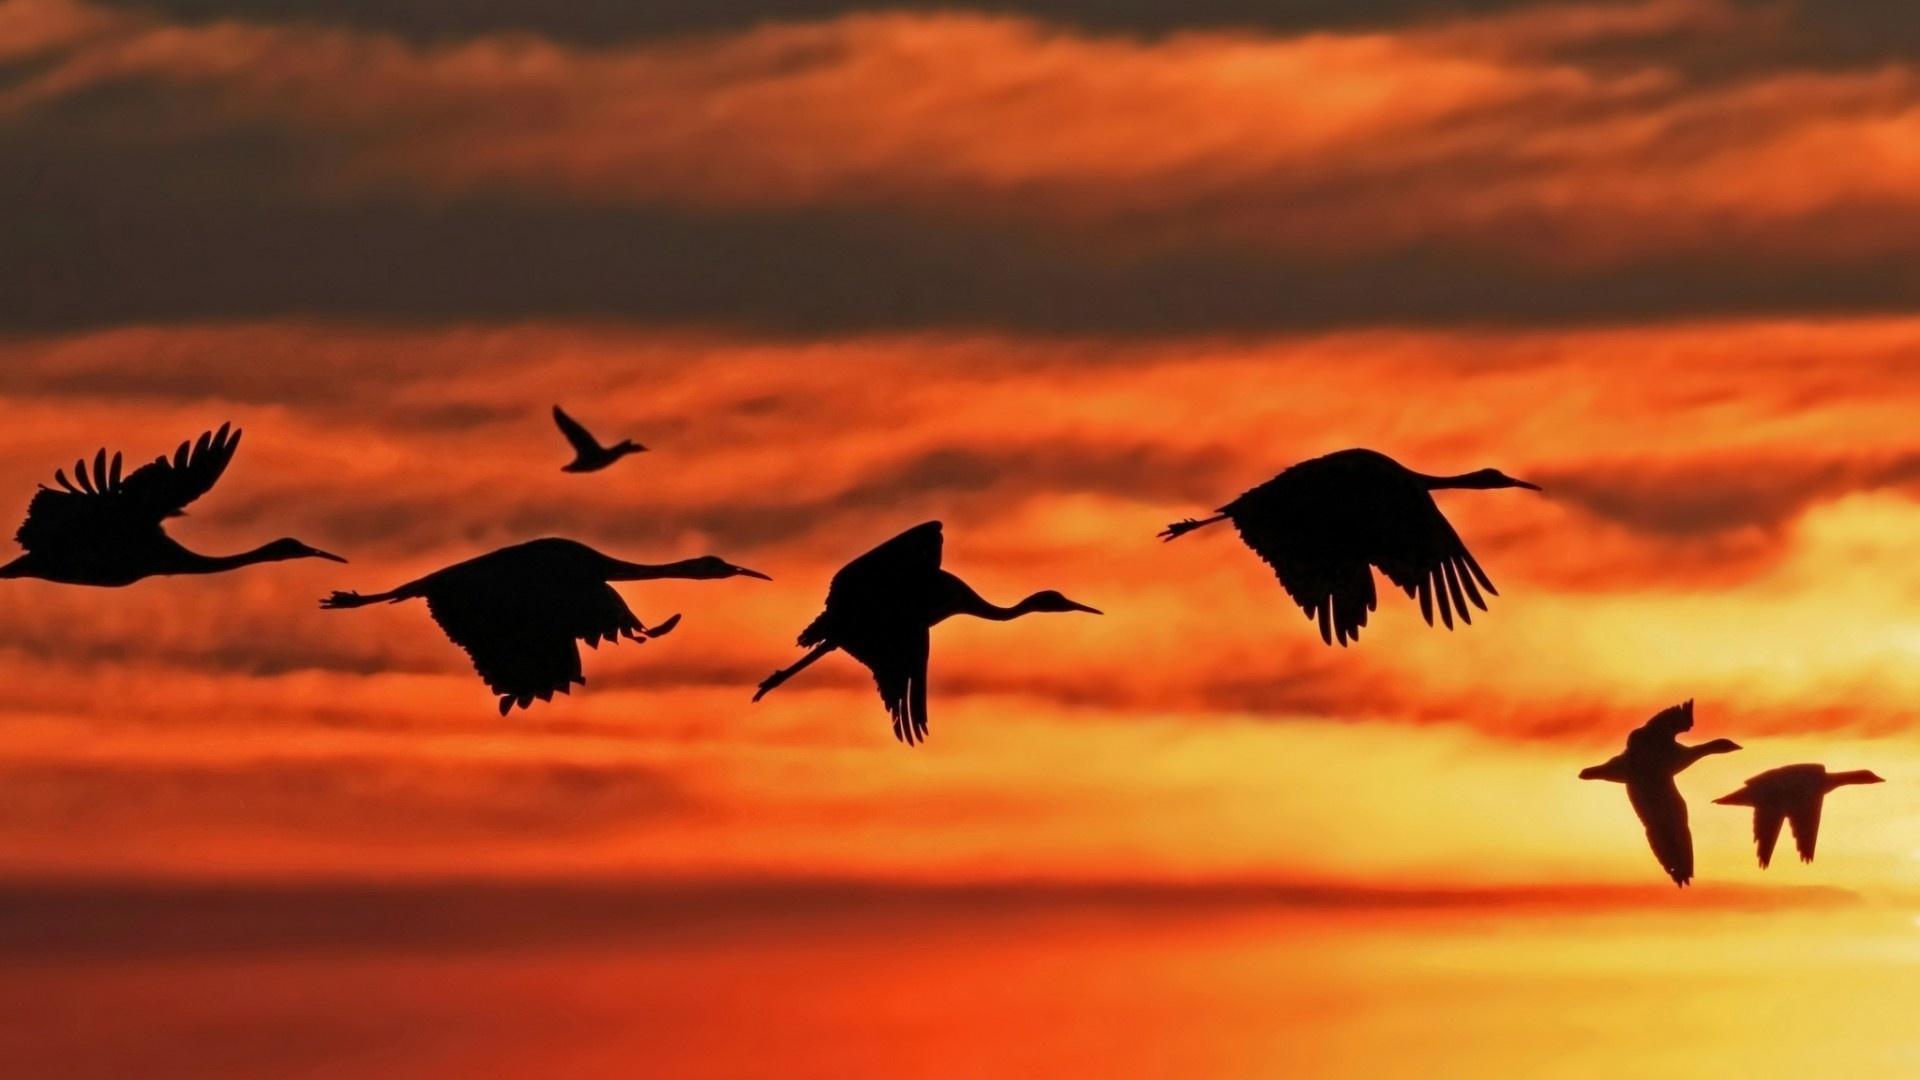 Wedge Birds In The Sky Image